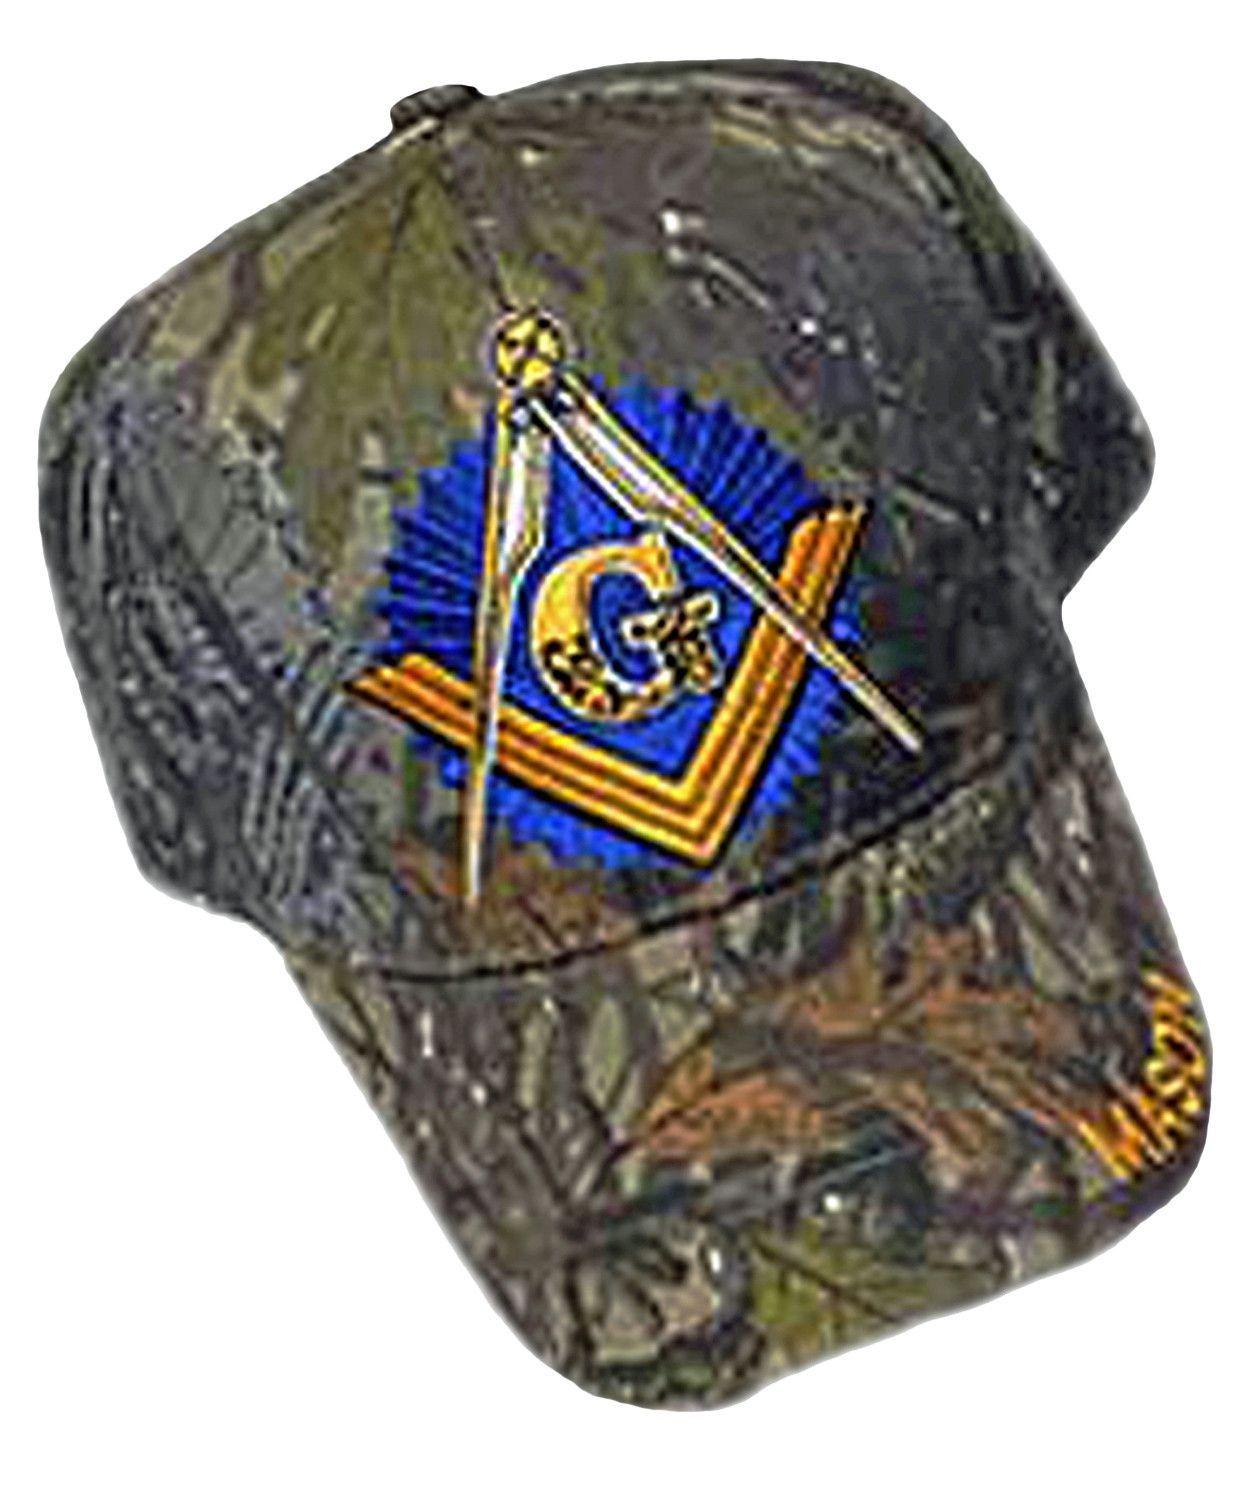 fd7e5c21f6 Mason Hat Camouflage Baseball Cap with Master Masonic Logo Freemasons  Shriners Prince Hall Camo Lodge Headwear